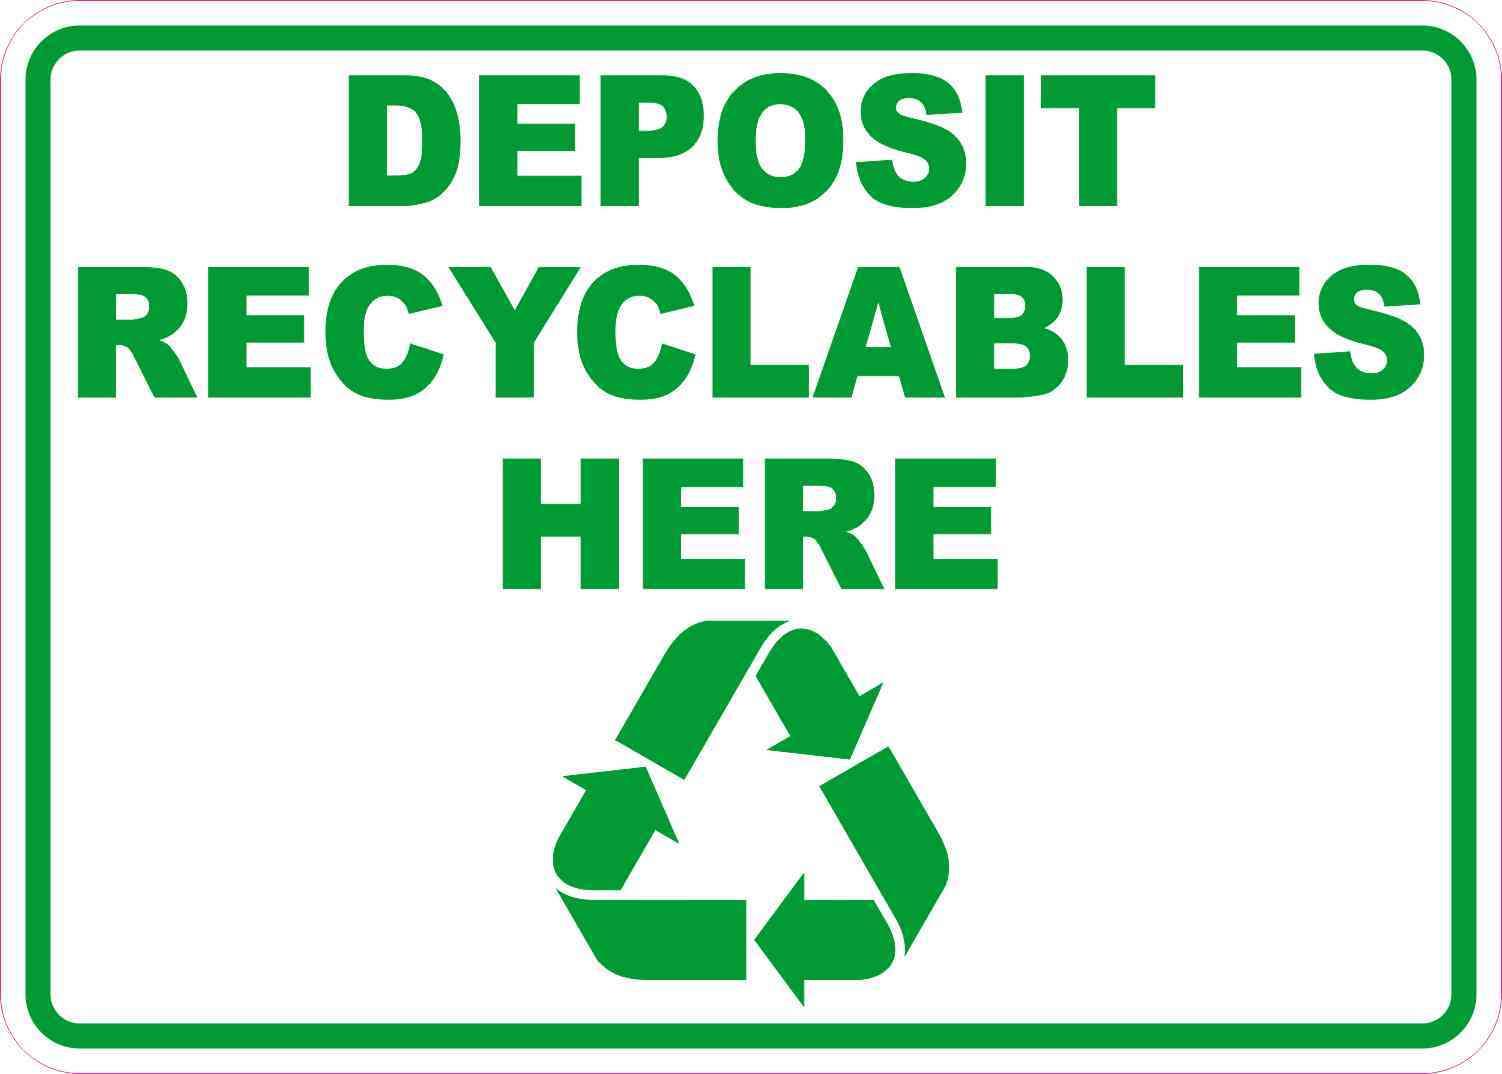 Deposit Recyclables Here Sticker